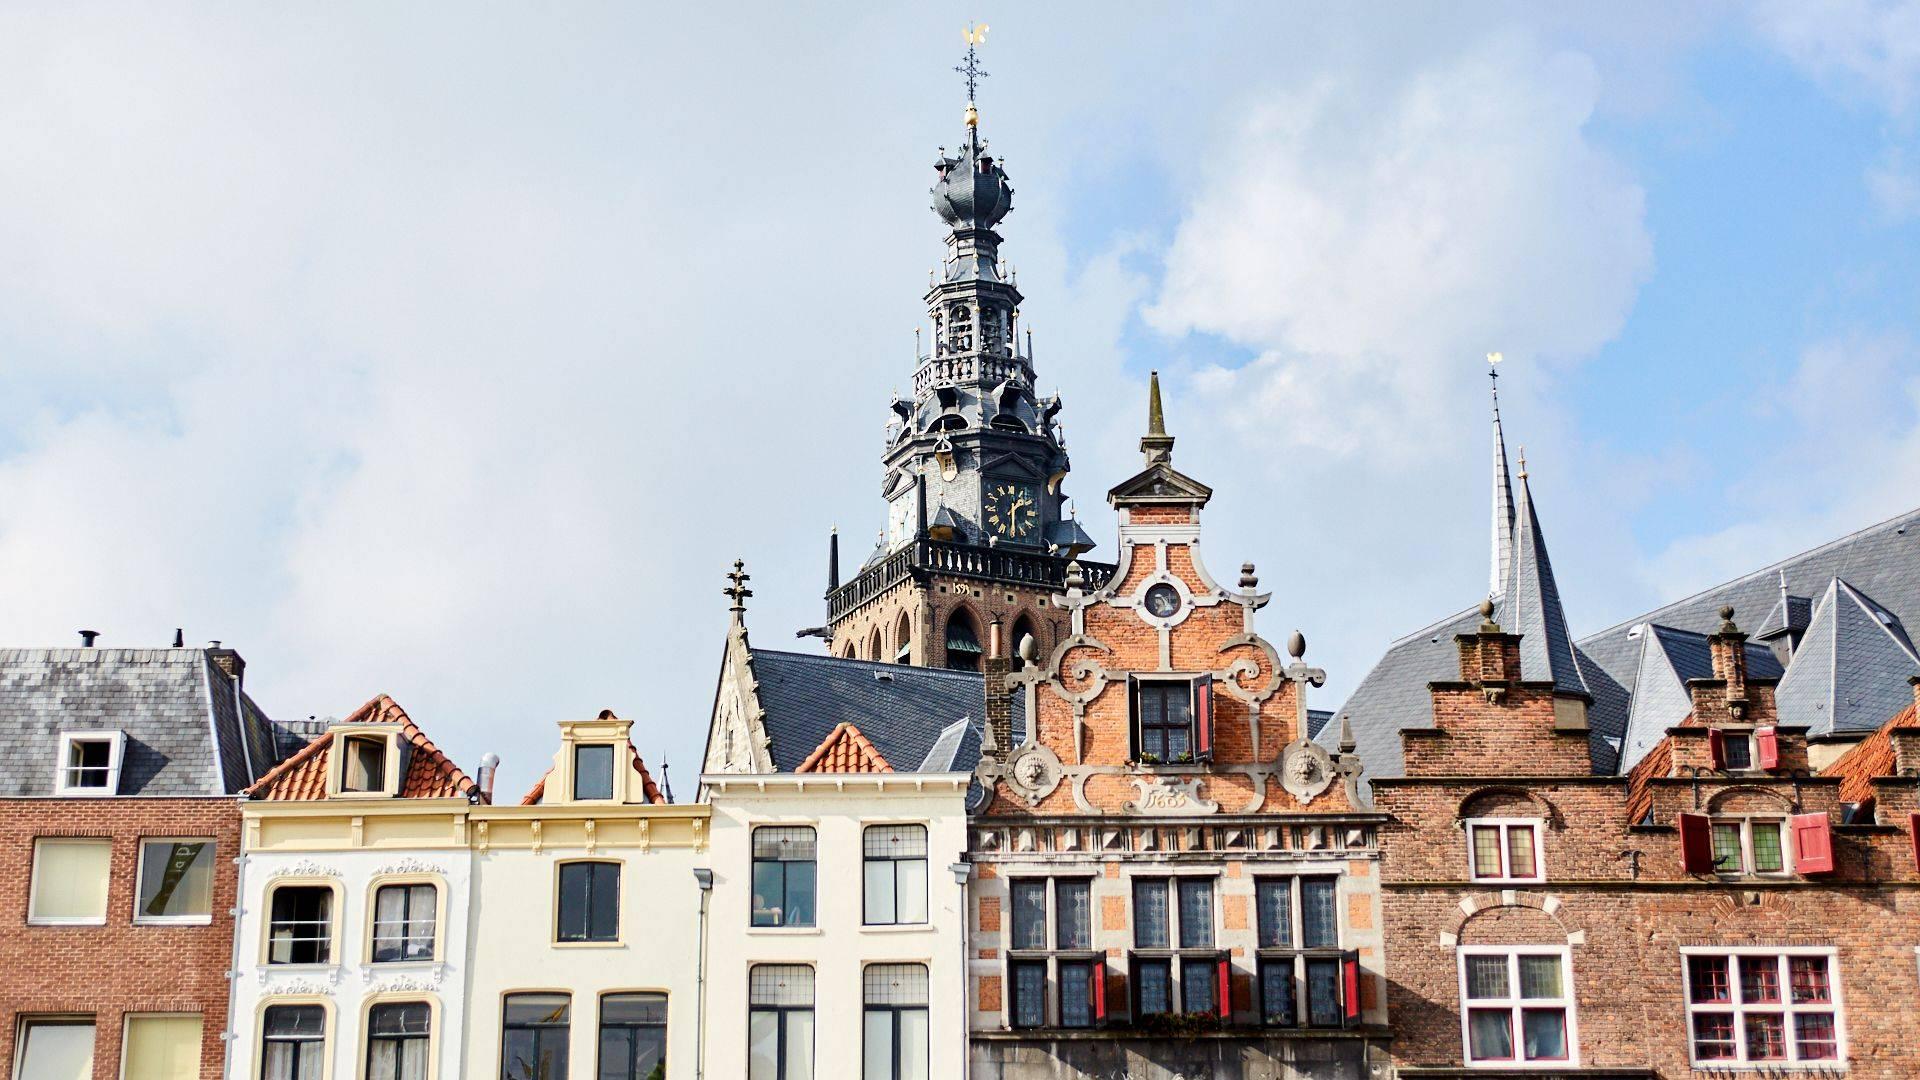 Stedentrip Nijmegen Kerk